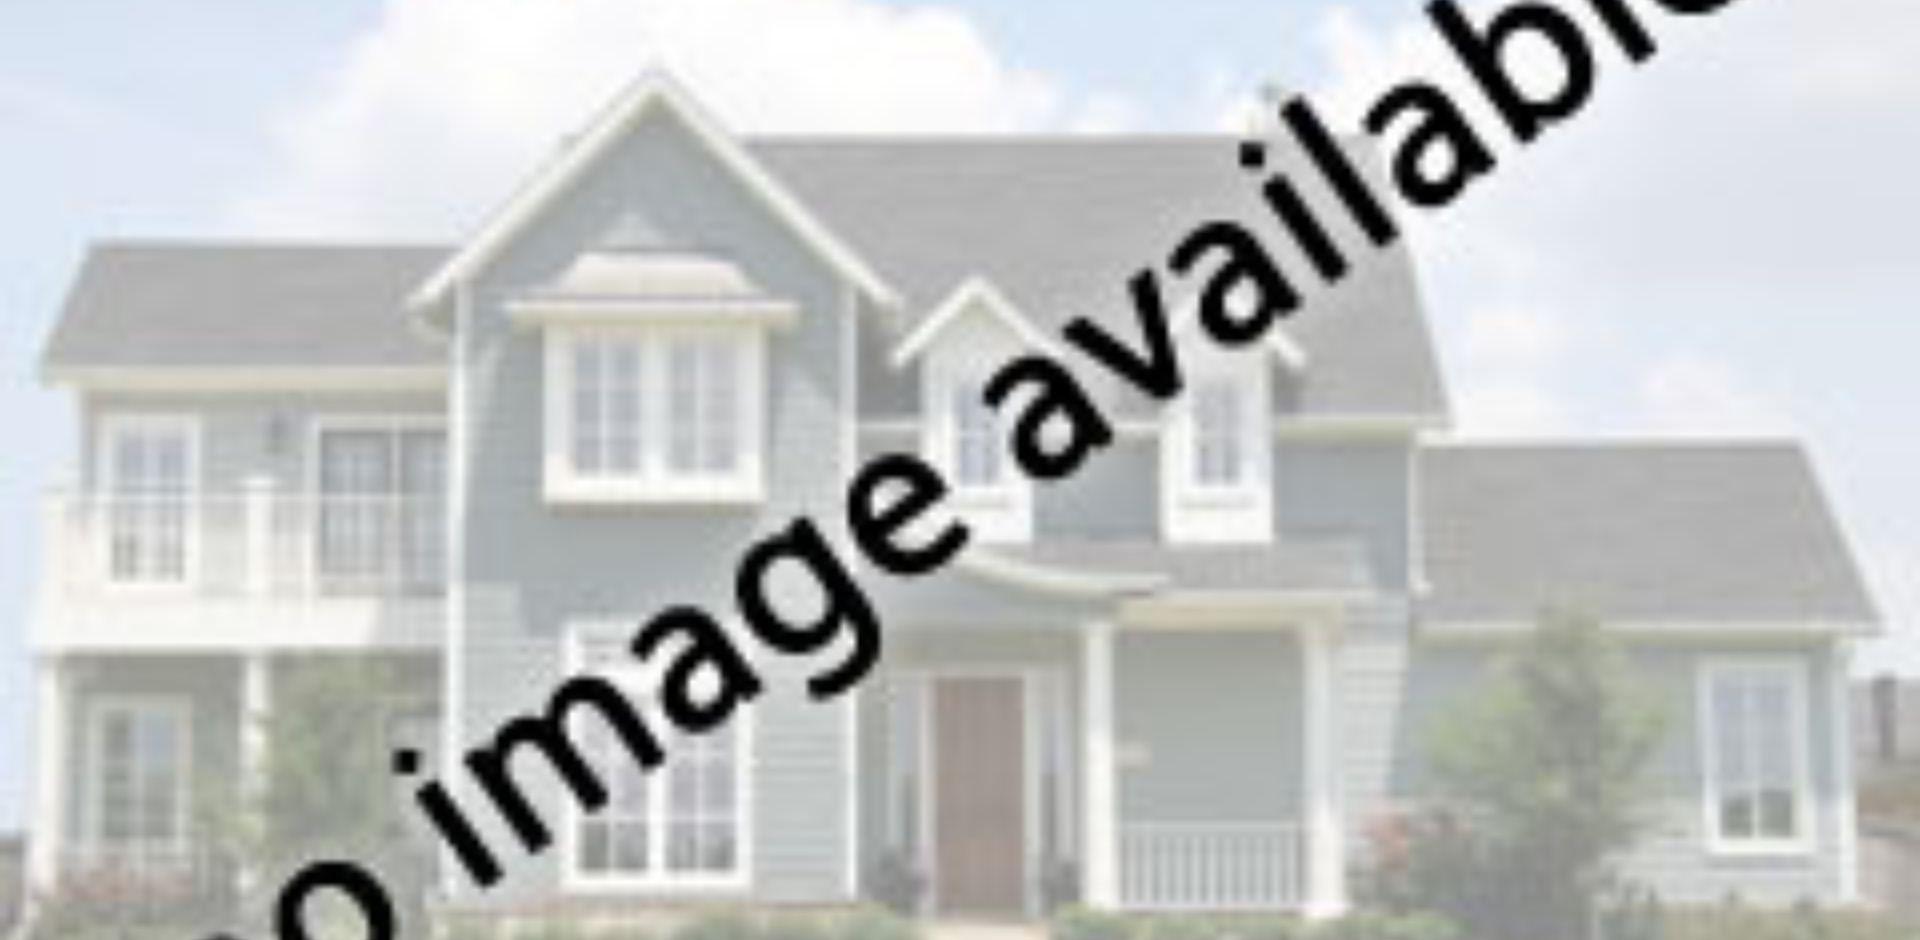 4212 Lomo Alto Drive #104 Highland Park, TX 75219 - Image 4